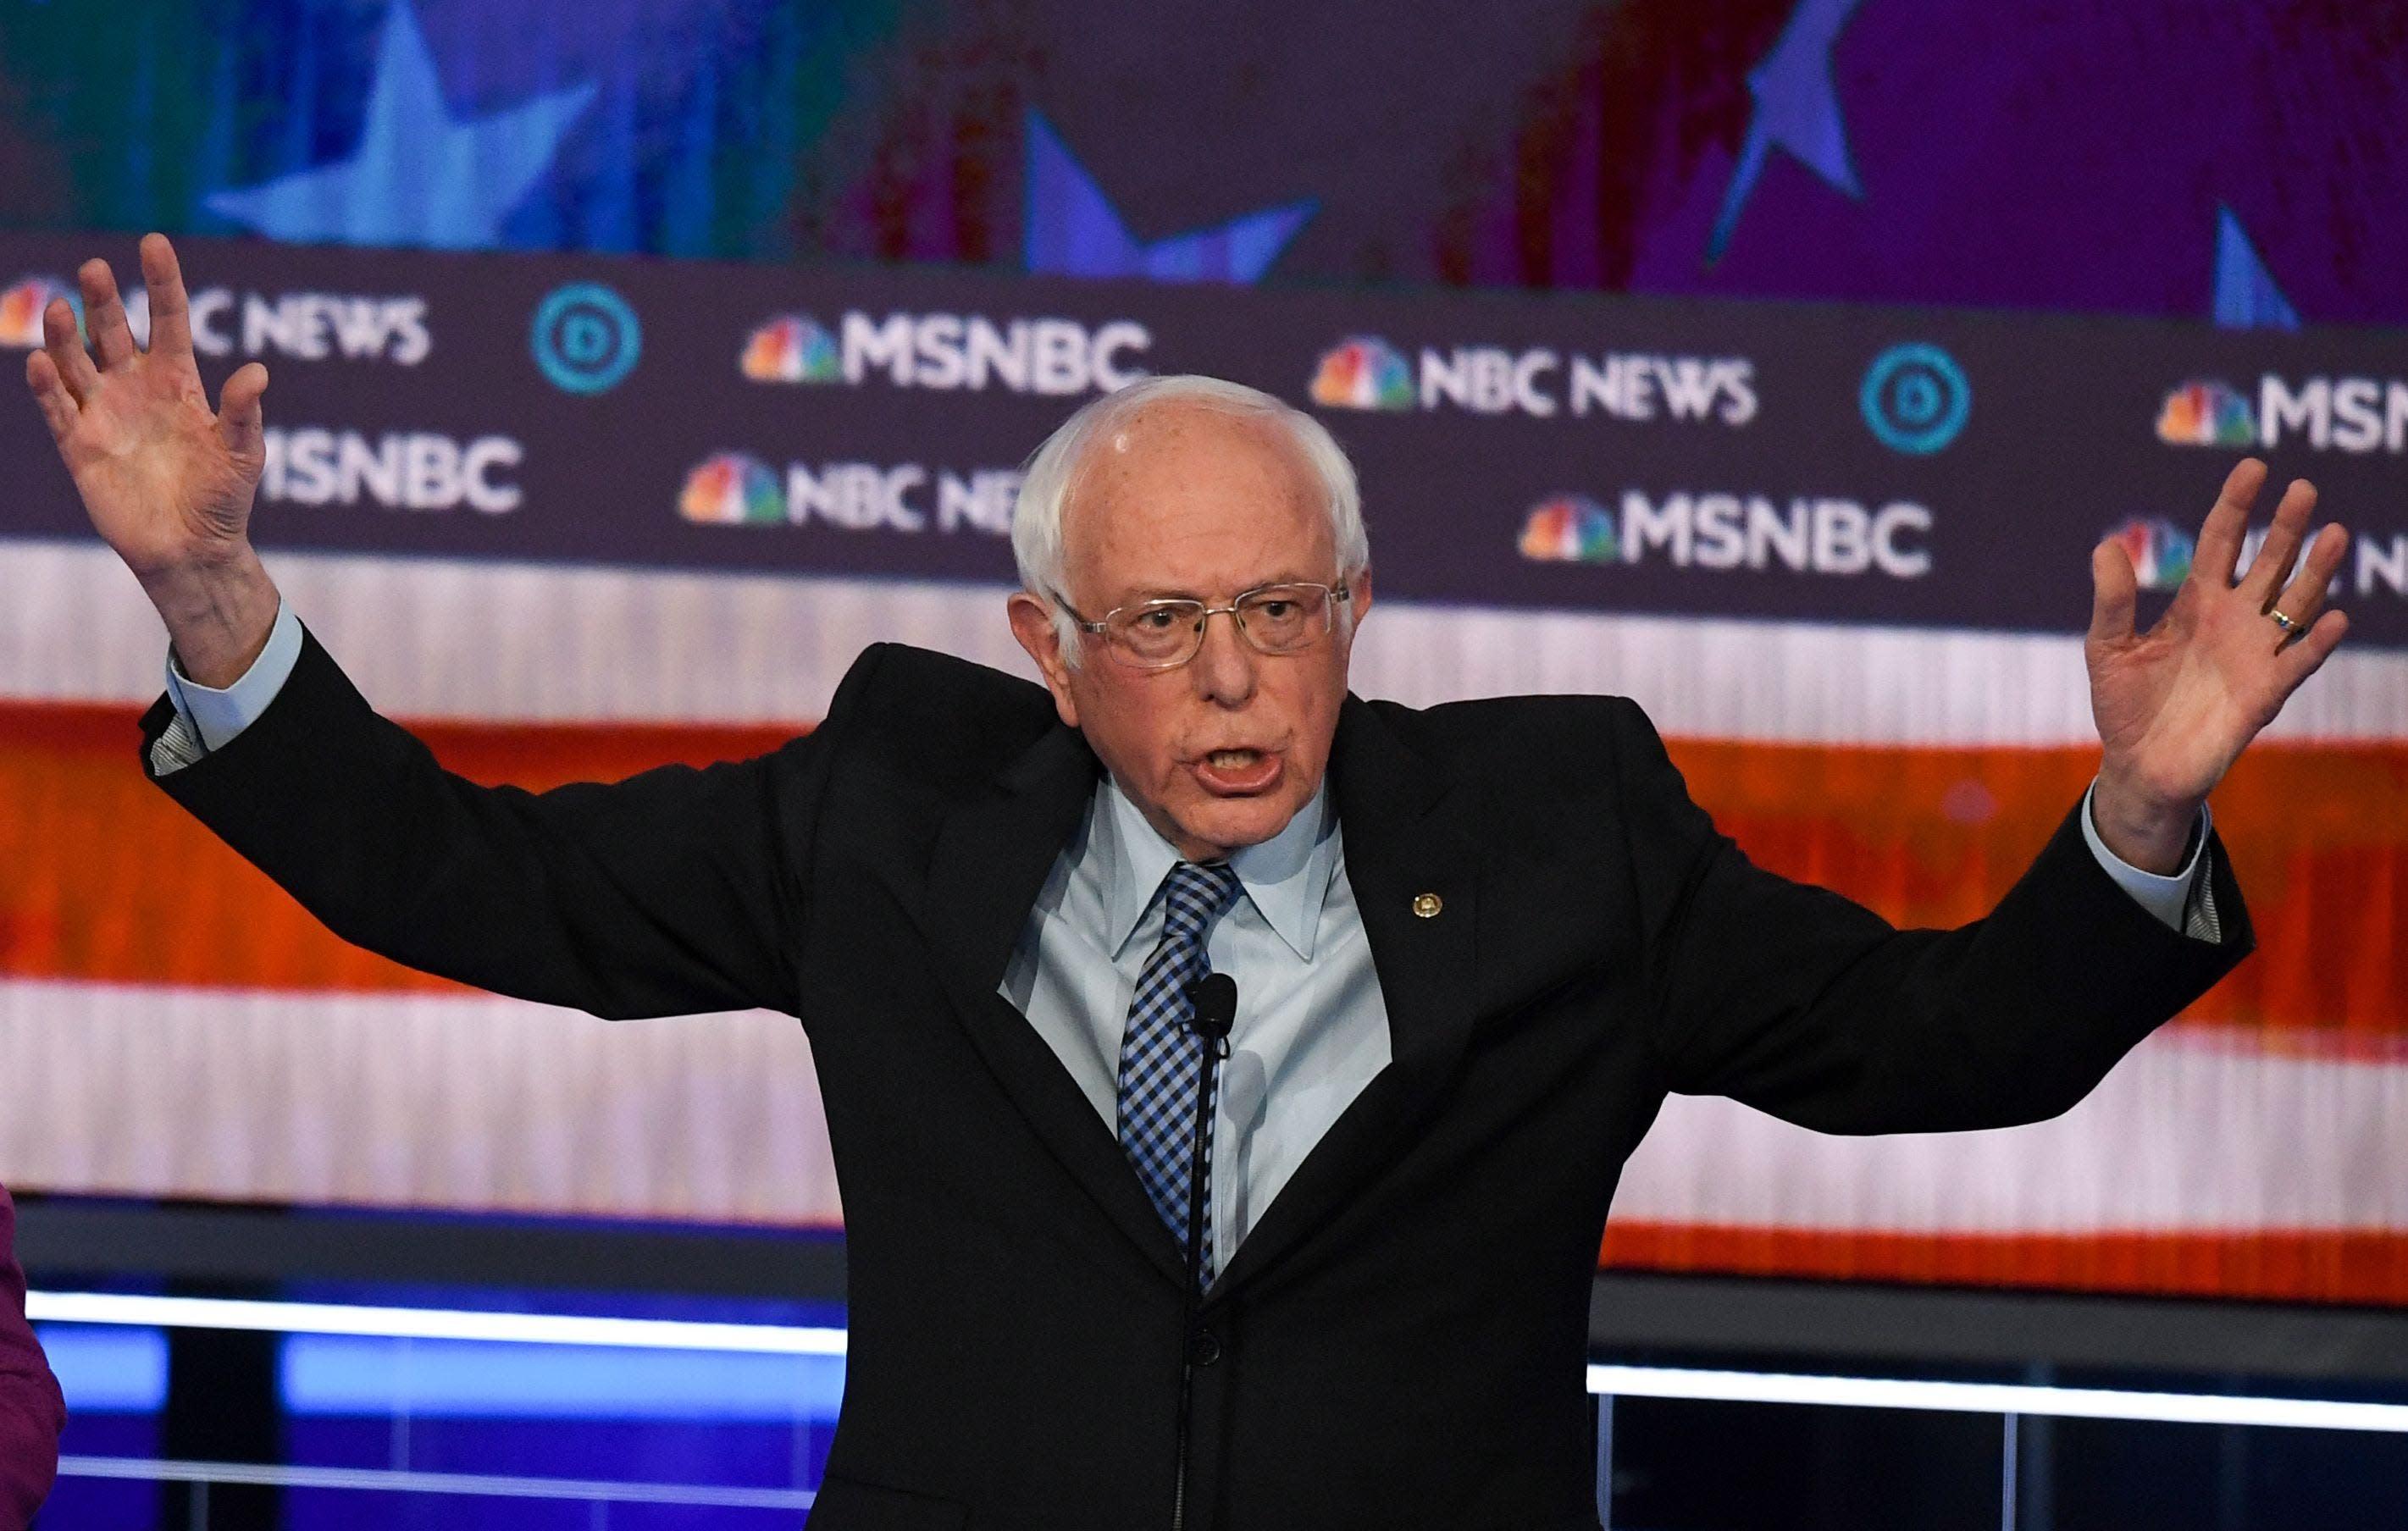 Poll: Bernie Sanders surging ahead of the pack among California voters